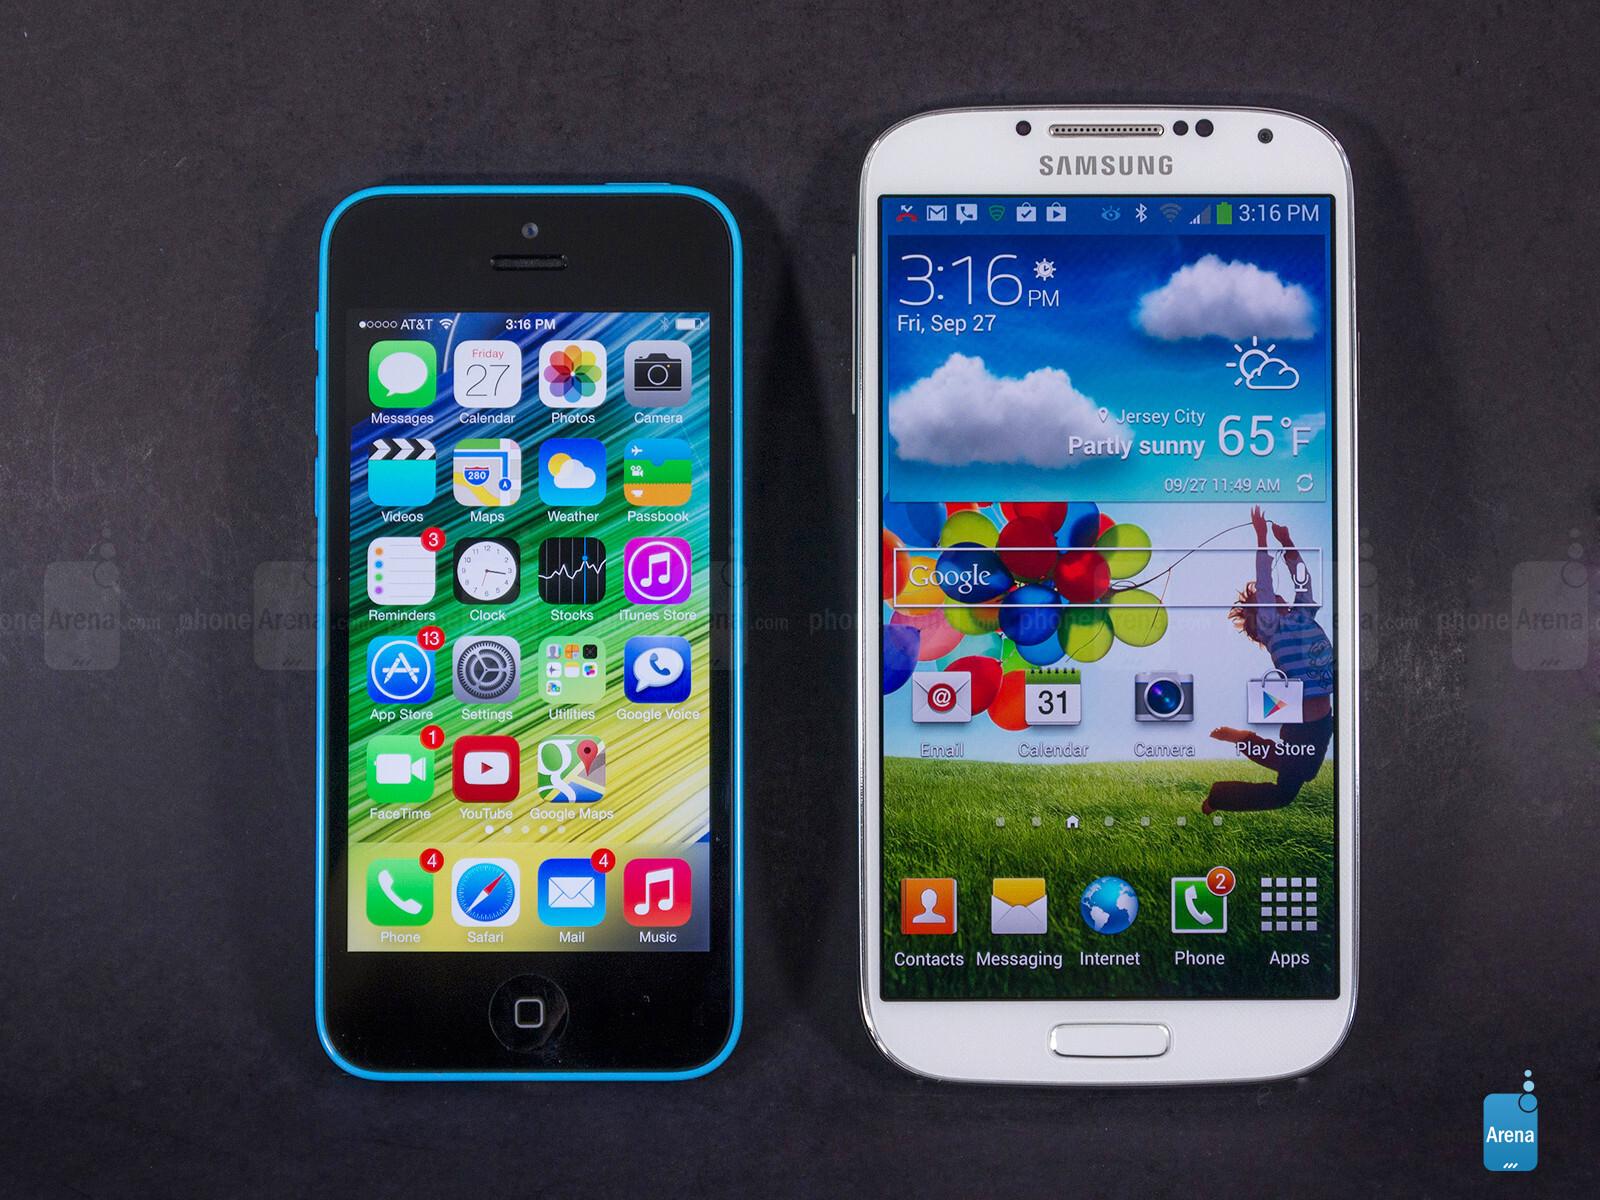 Samsung Galaxy S4 Vs Iphone 5 Price